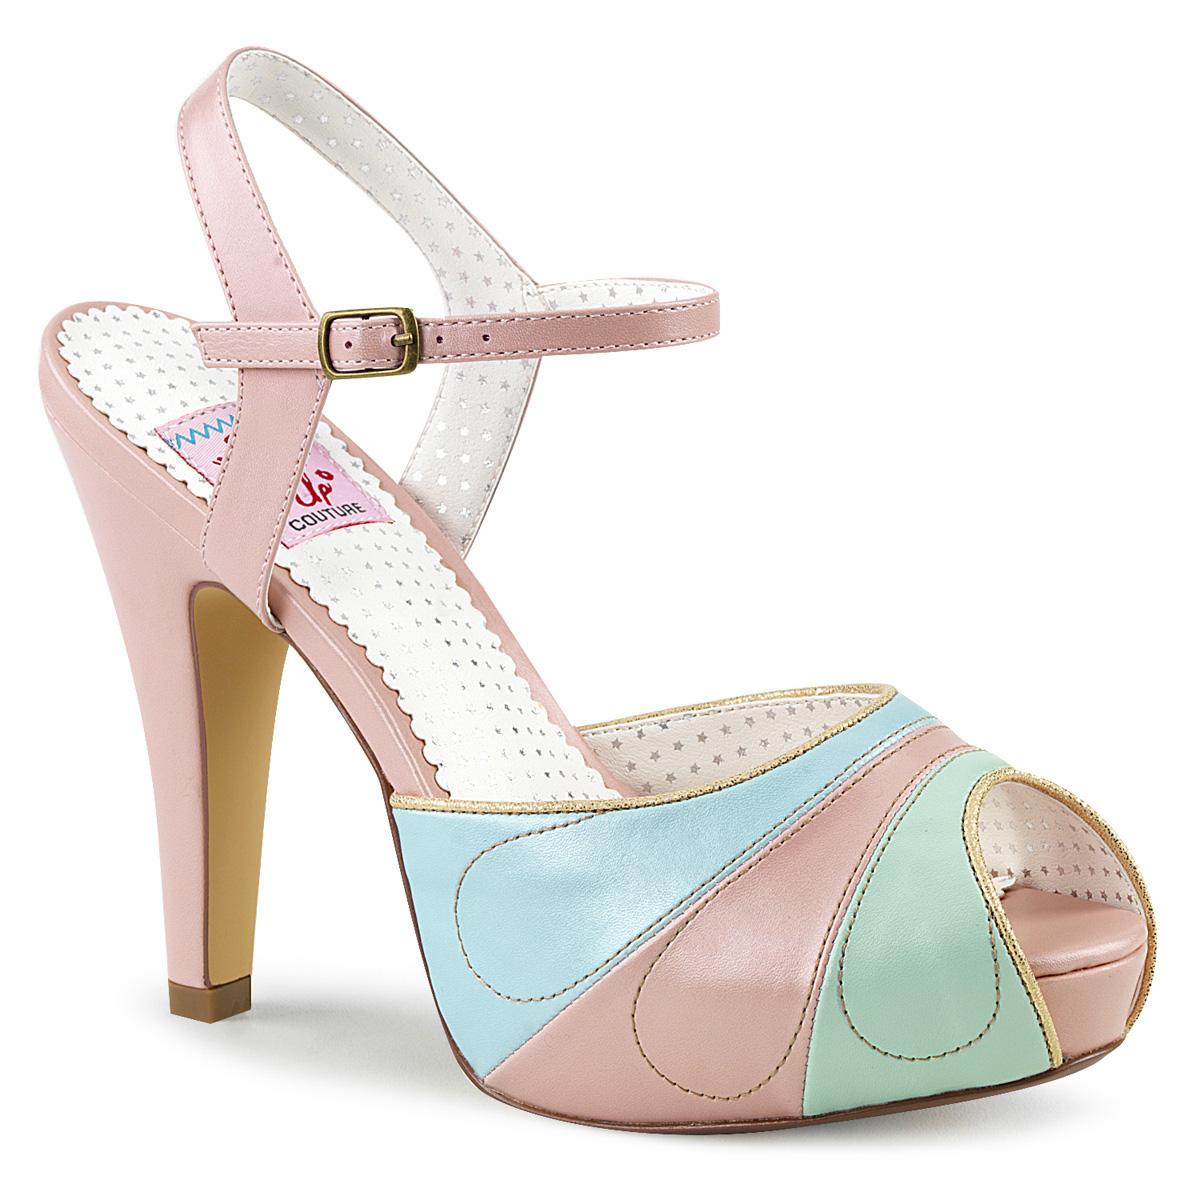 79af93b662df Retro Sandal BETTIE-27 - Pink · Retro Sandal BETTIE-27 - Pink. Multicolored peep  toe high-heeled sandal with concealed platform